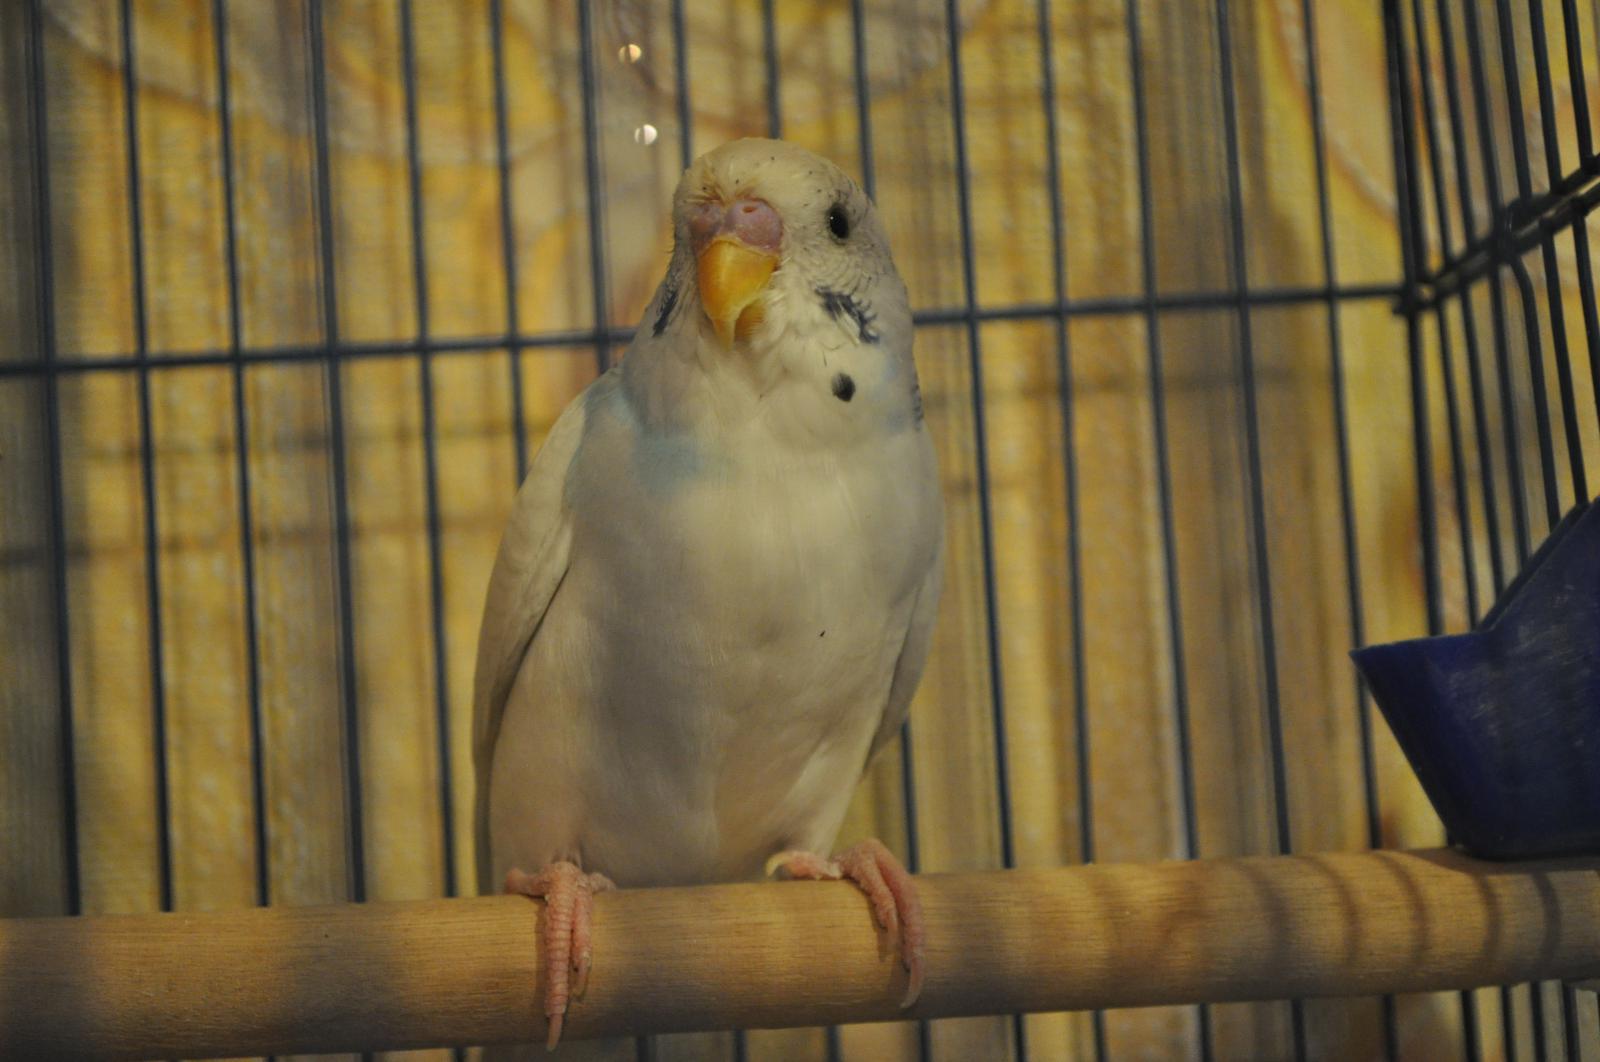 птиц - DSC_1285.JPG